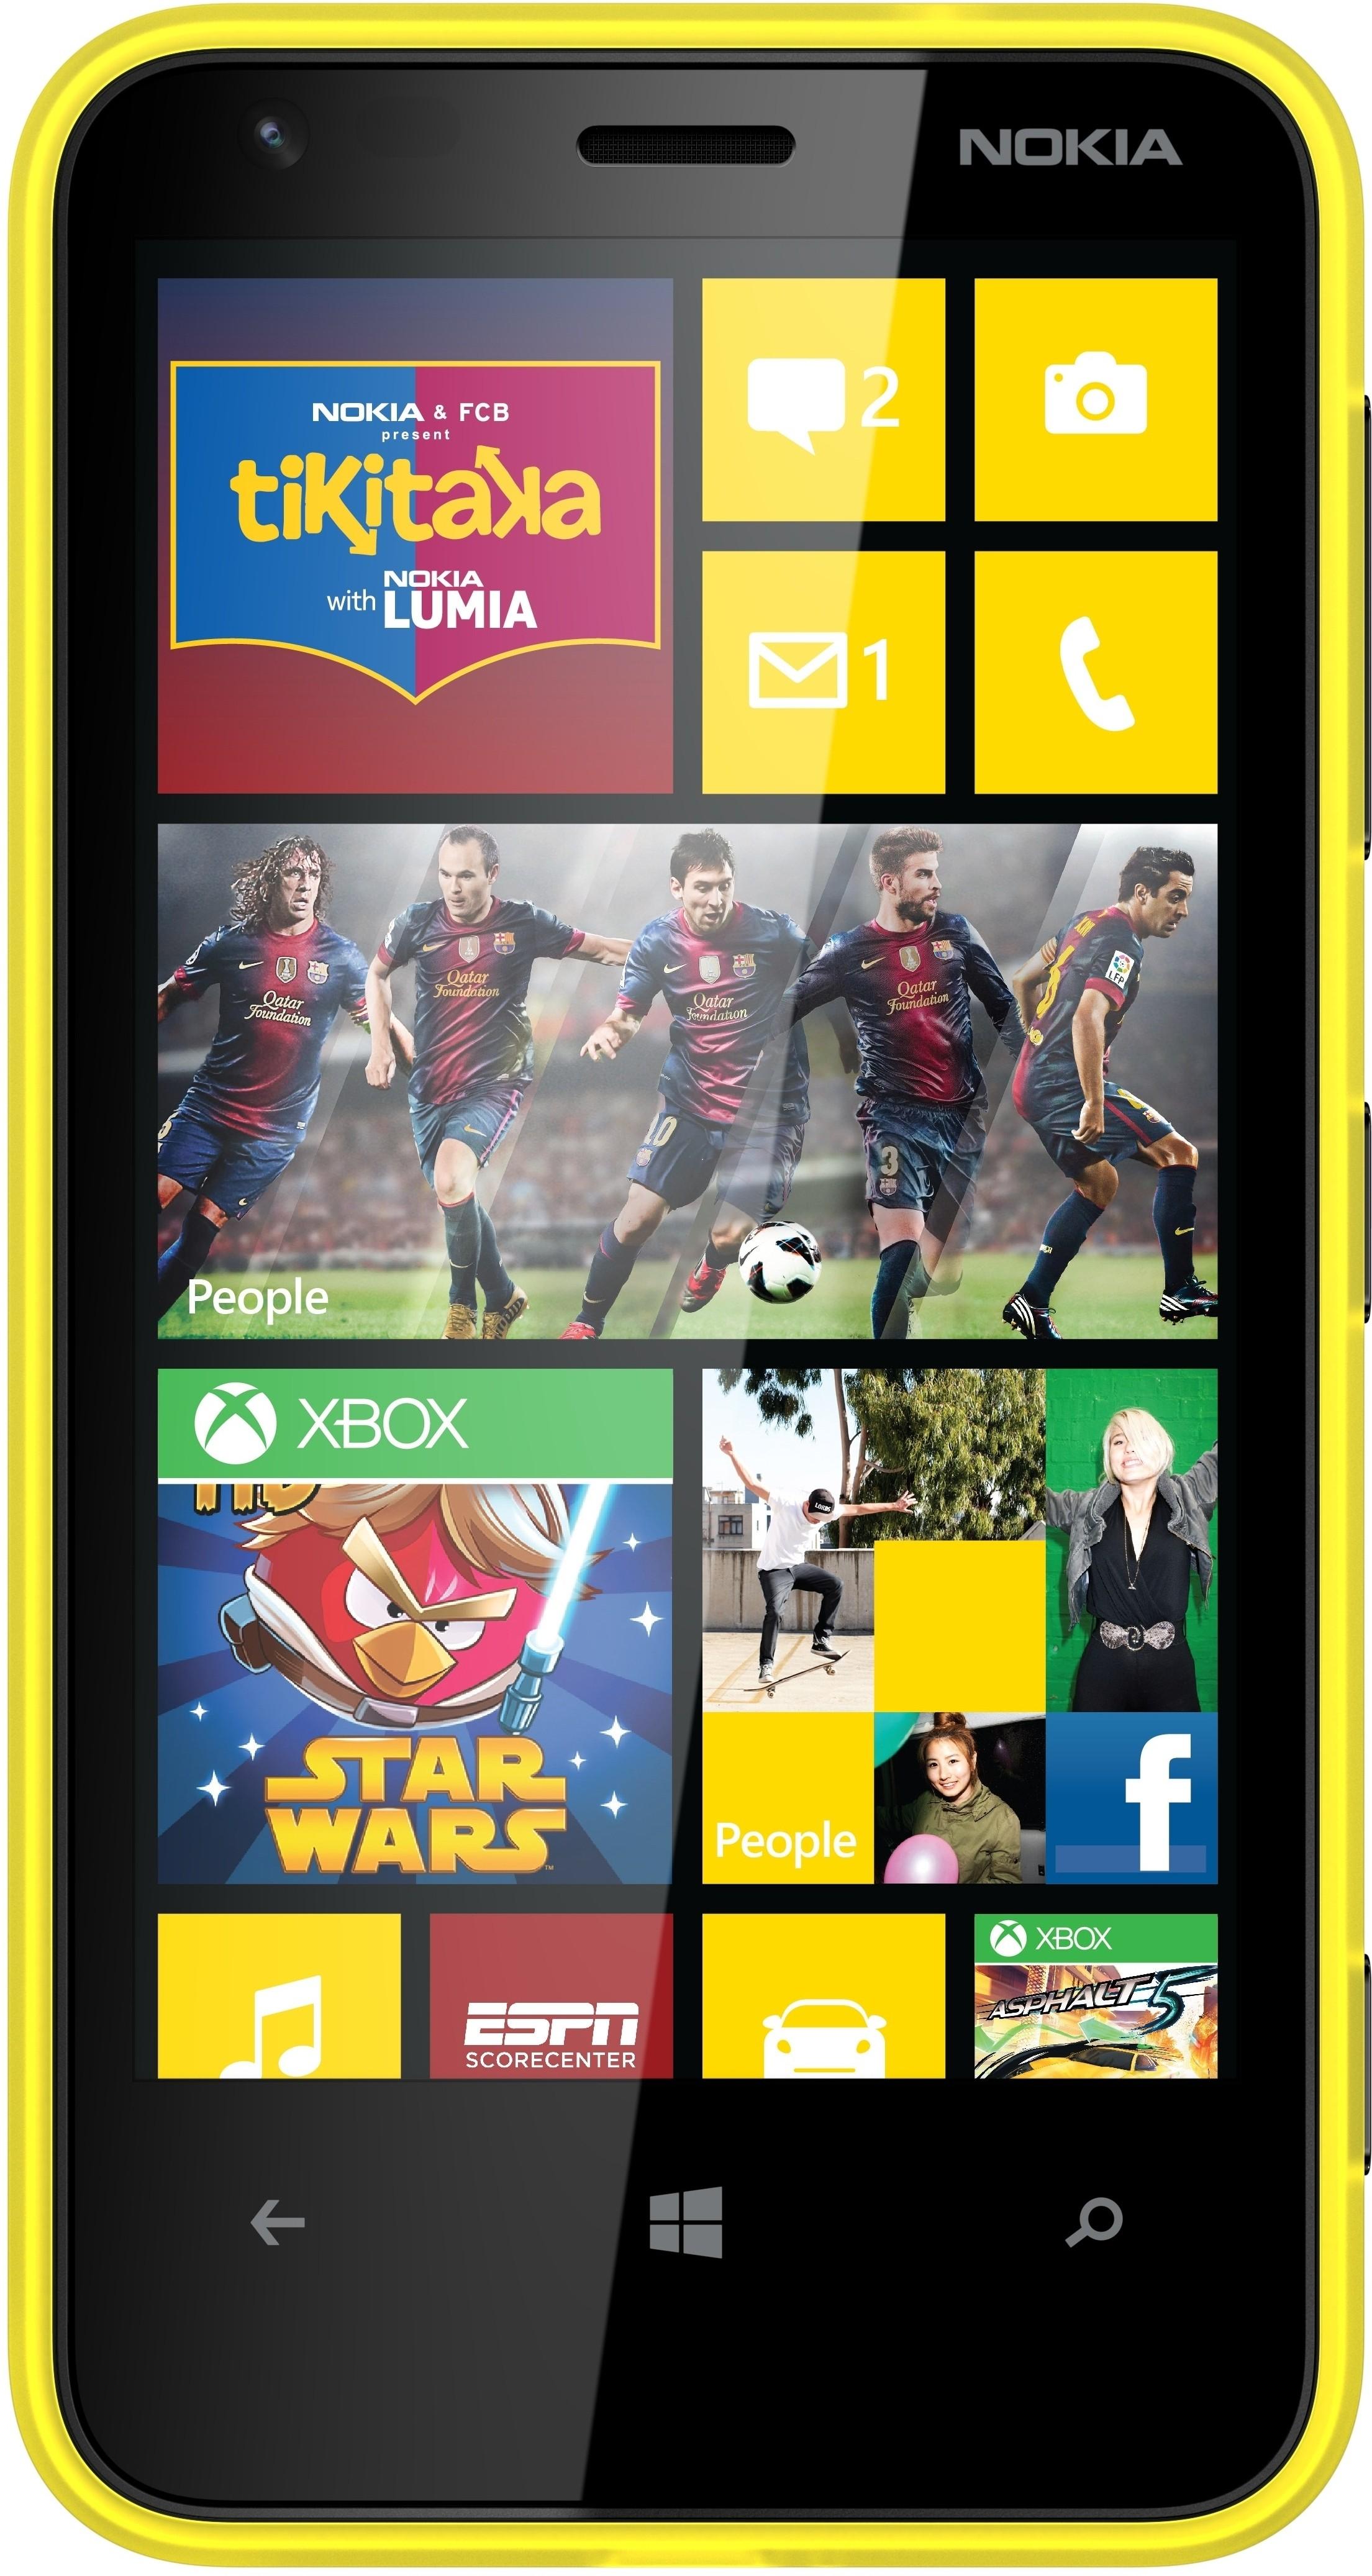 Nokia Lumia 620 (512MB RAM, 8GB)